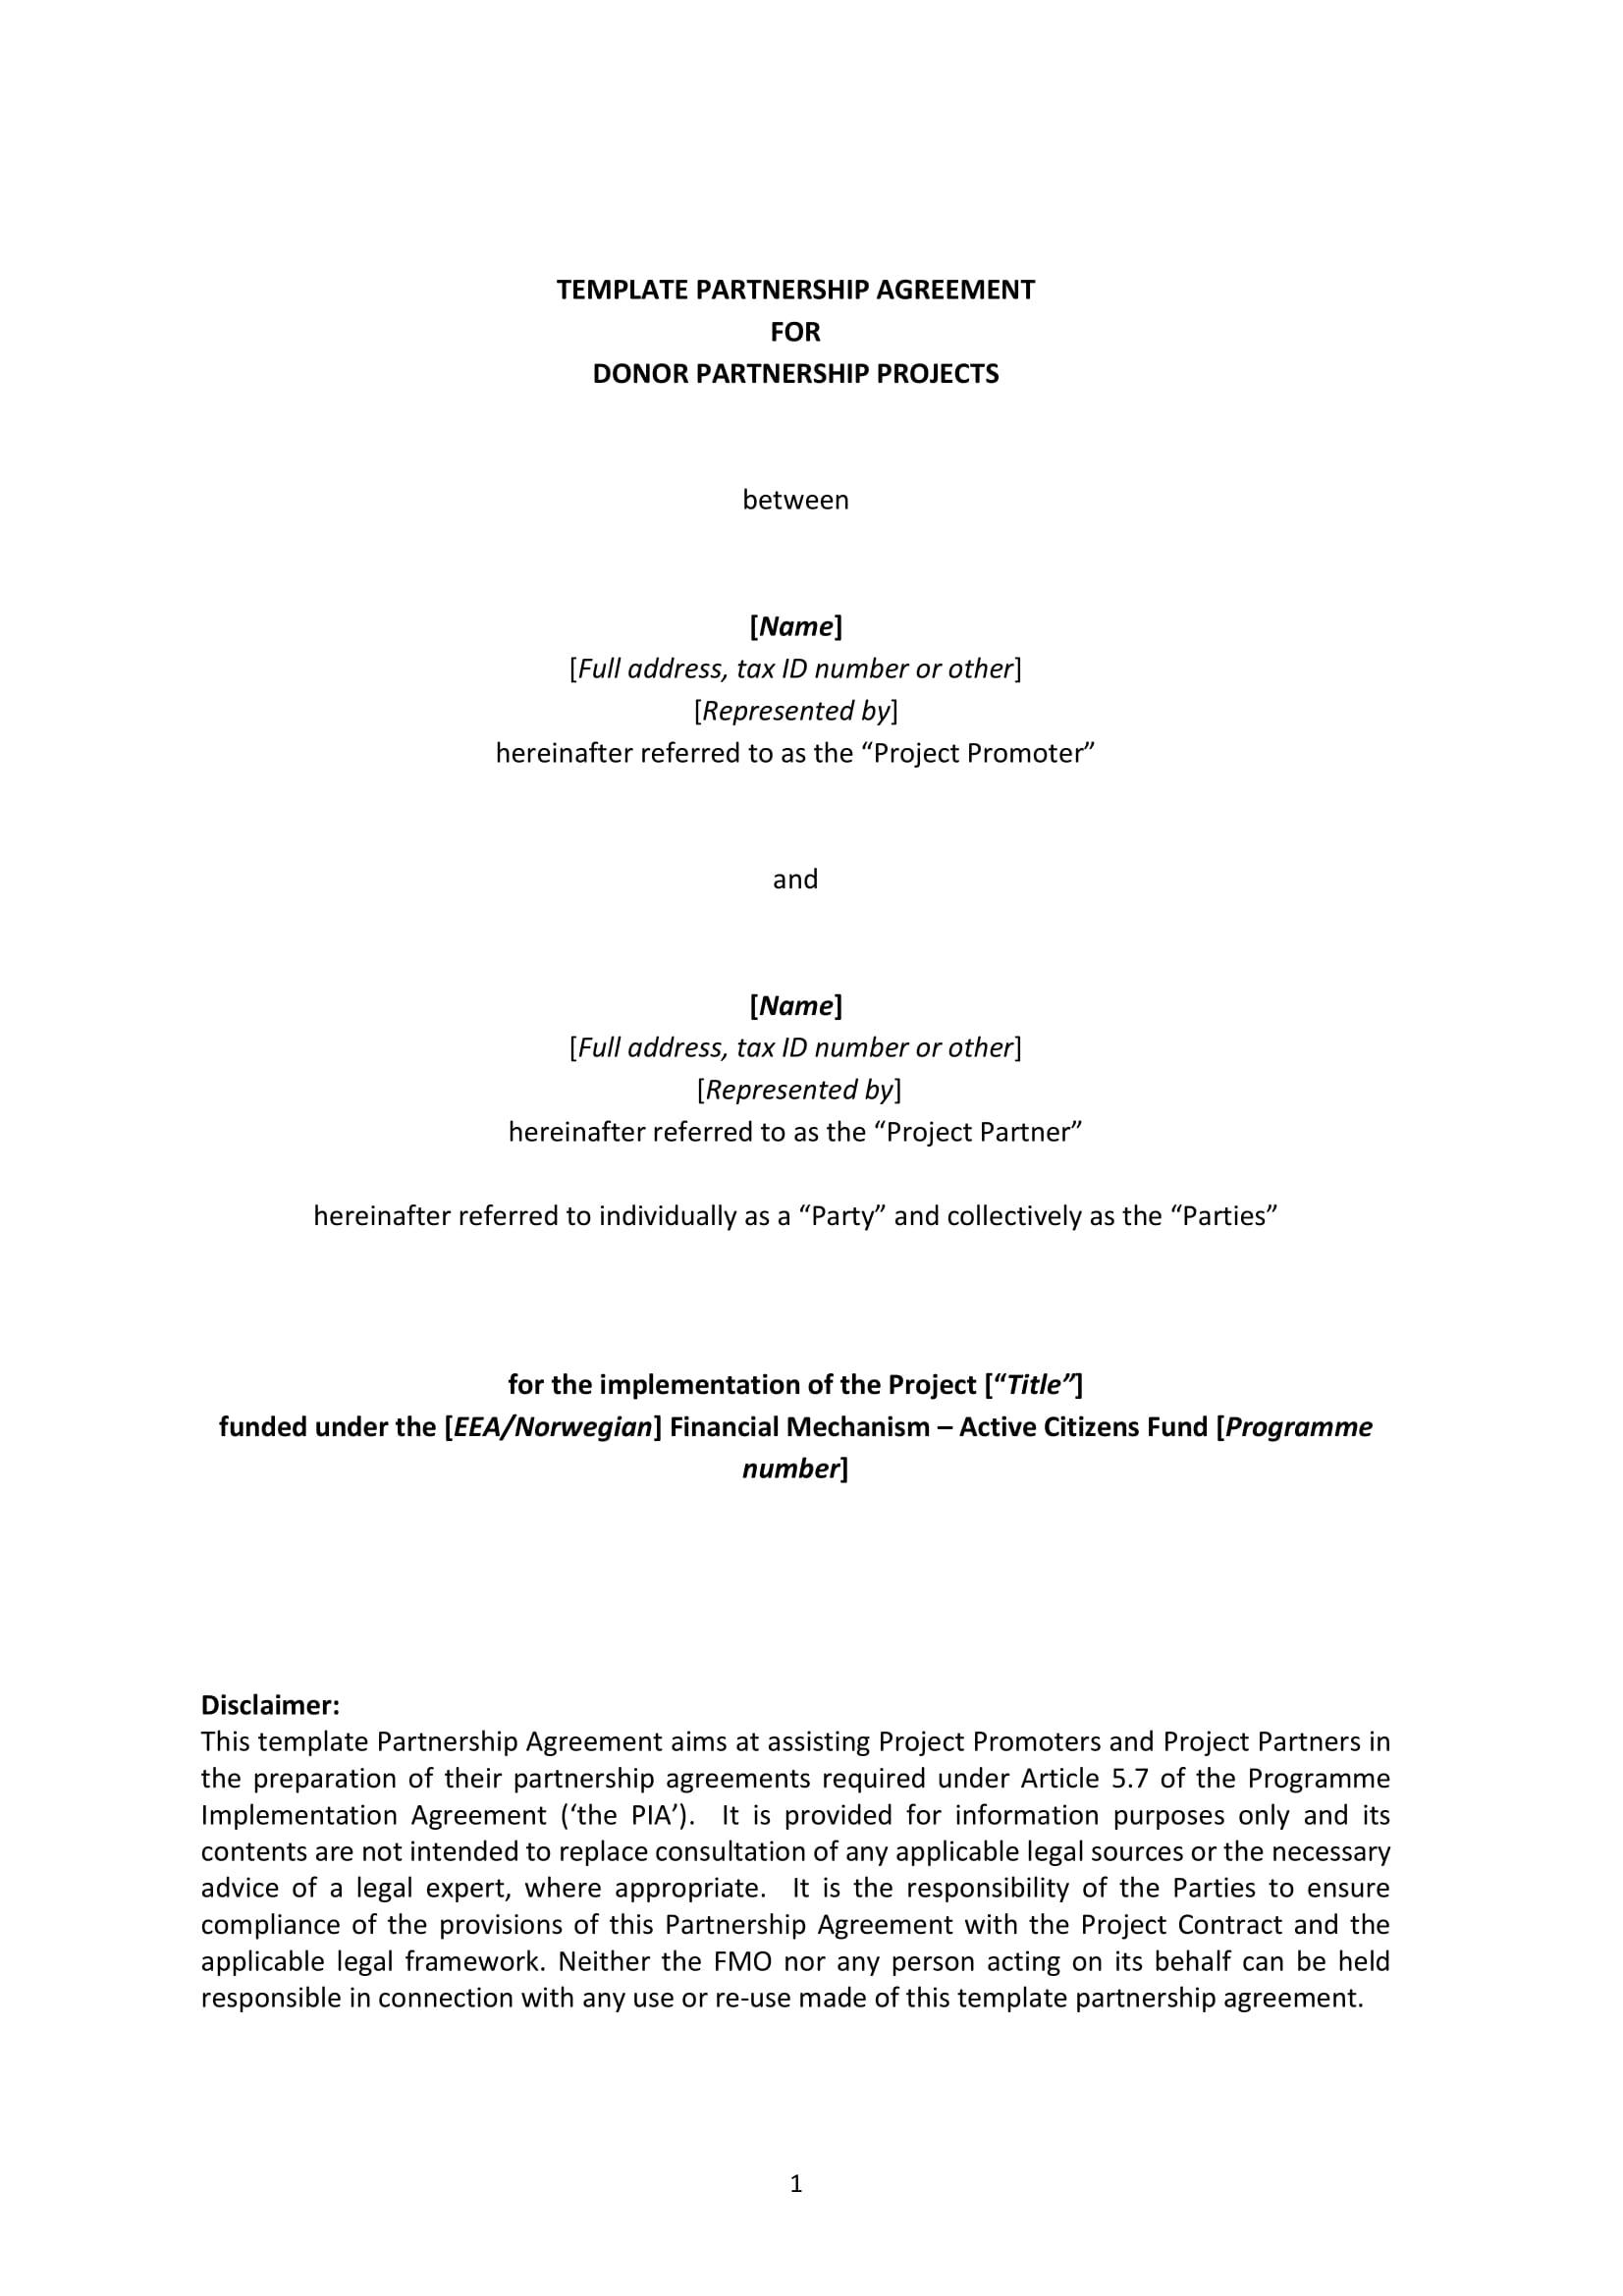 Bilateral Partnership Agreement Example